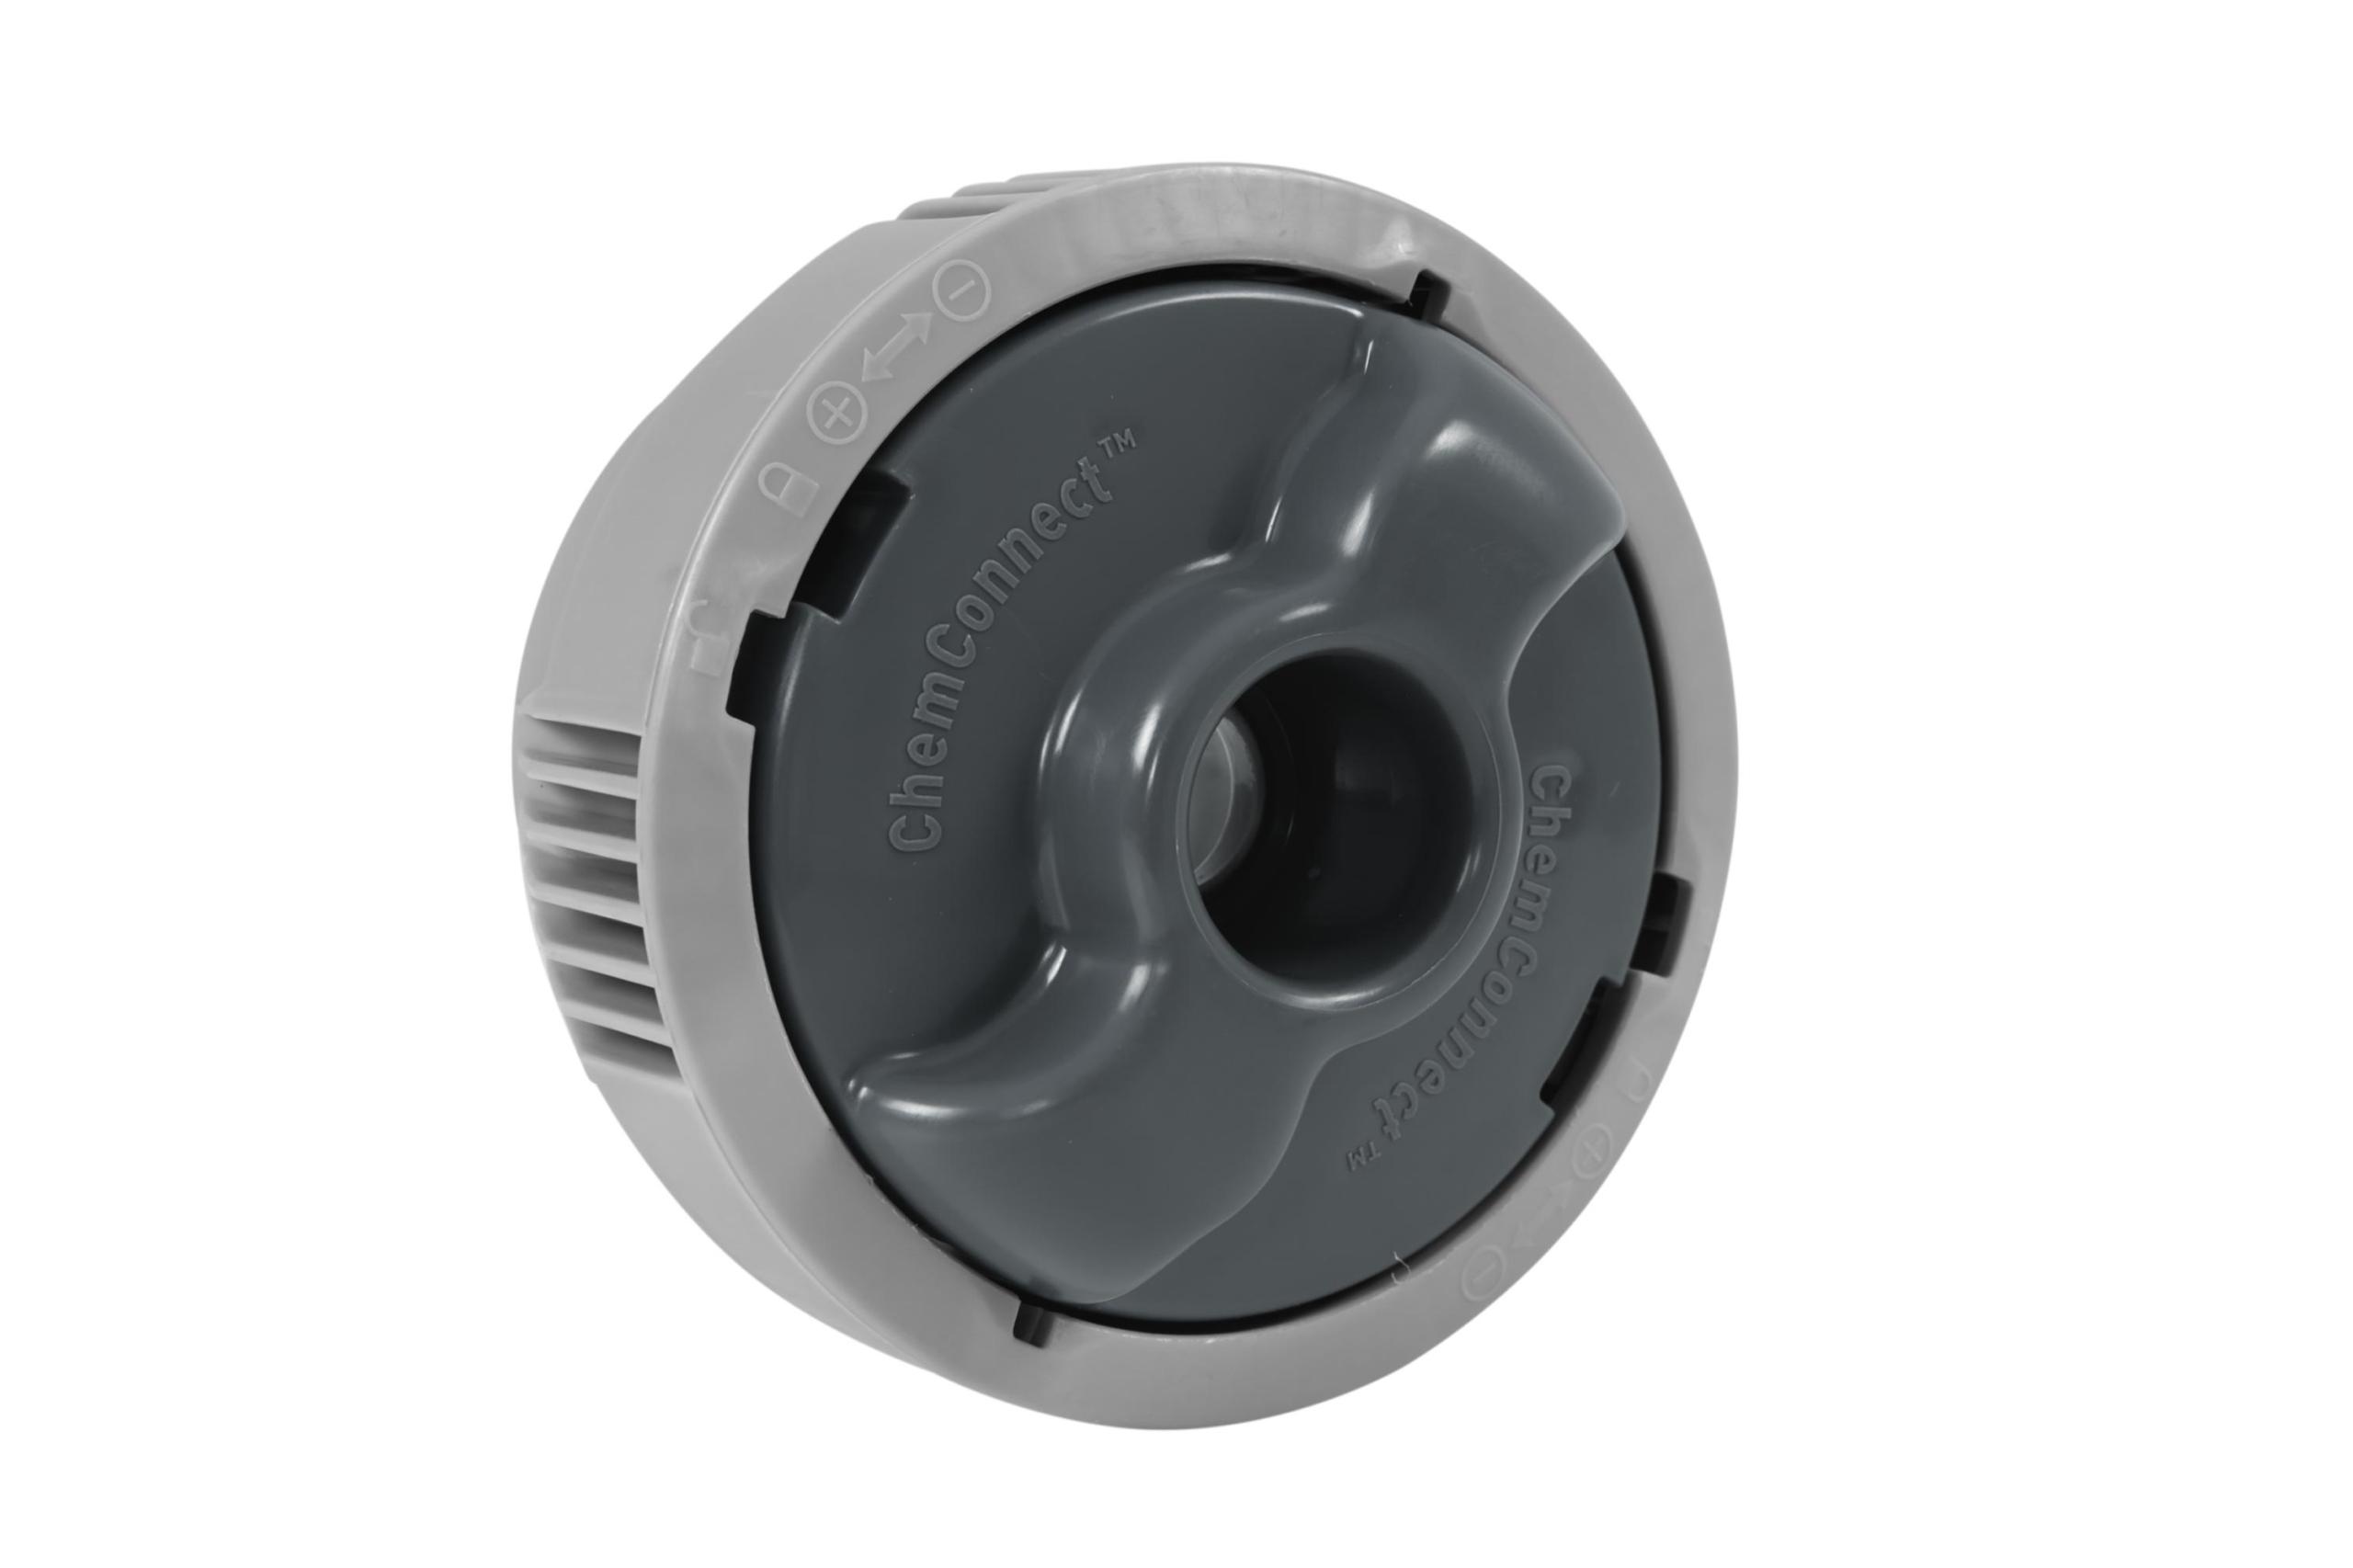 SPA ST. MORITZ 216x71 cm - 7 os. - BESTWAY 60023 Kod produktu 60023